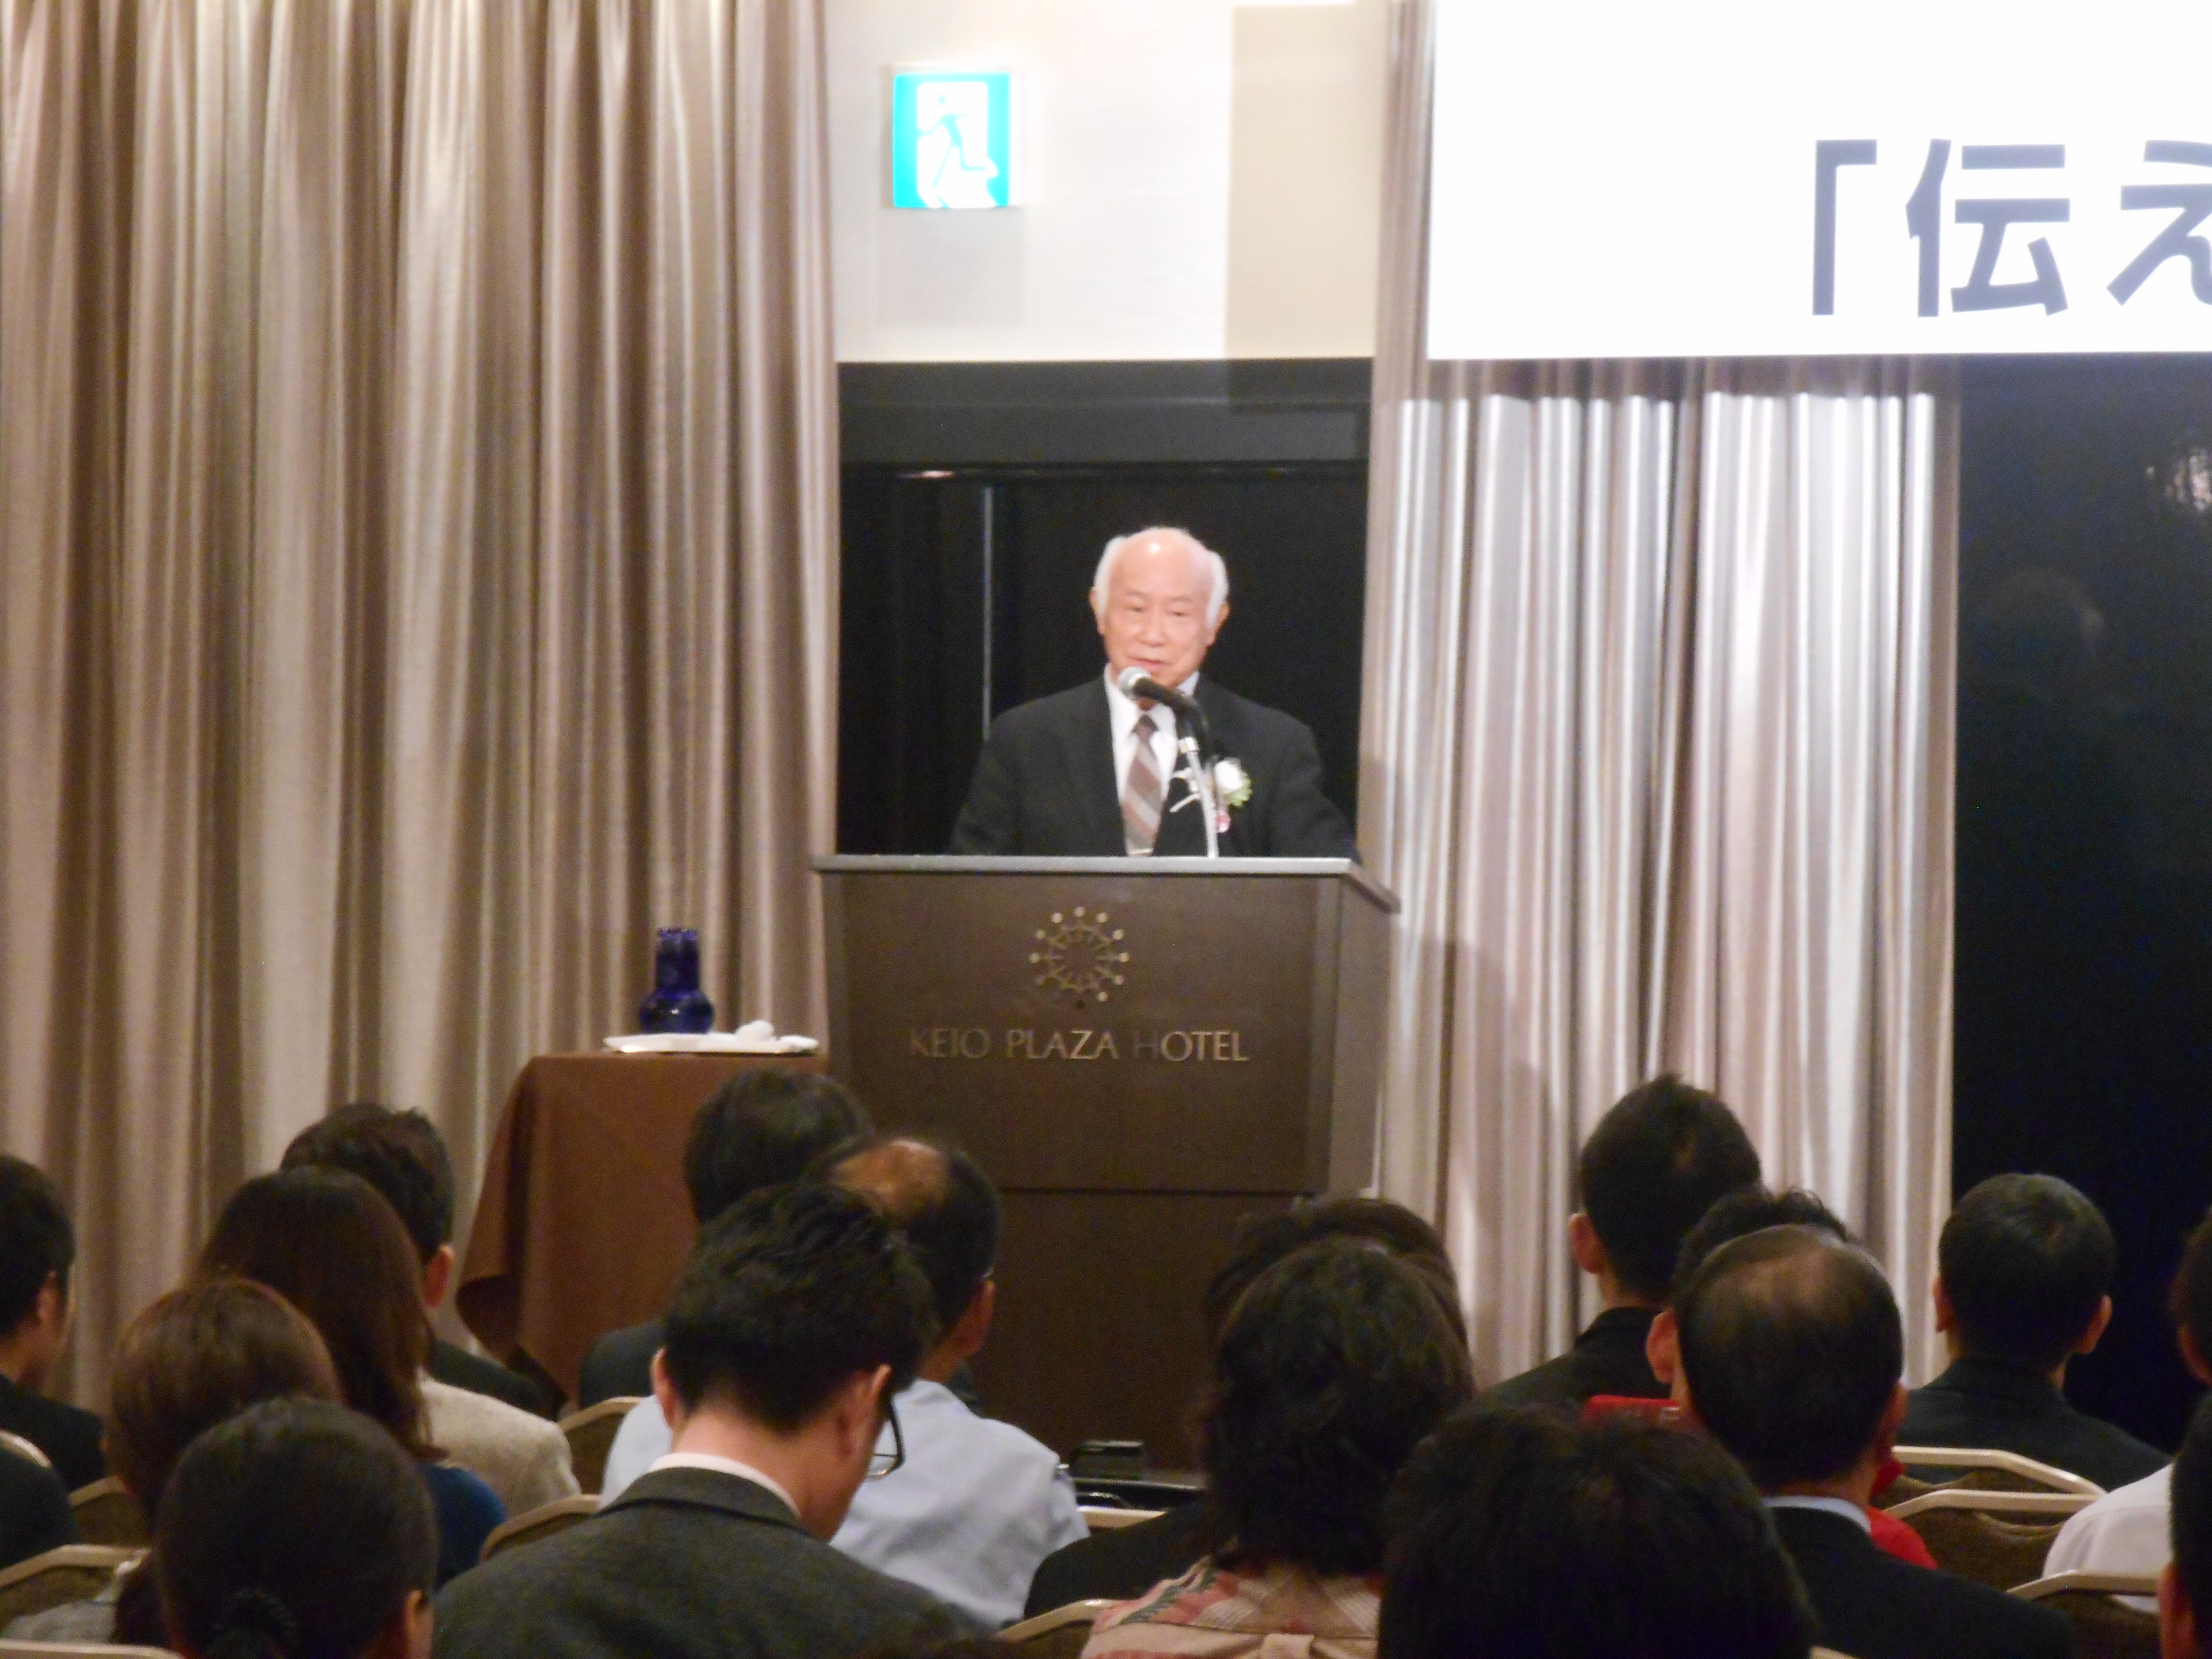 DSCN2063 - 平成30年度 東京思風塾 4月7日(土)「時代が問題をつくり、問題が人物をつくる」